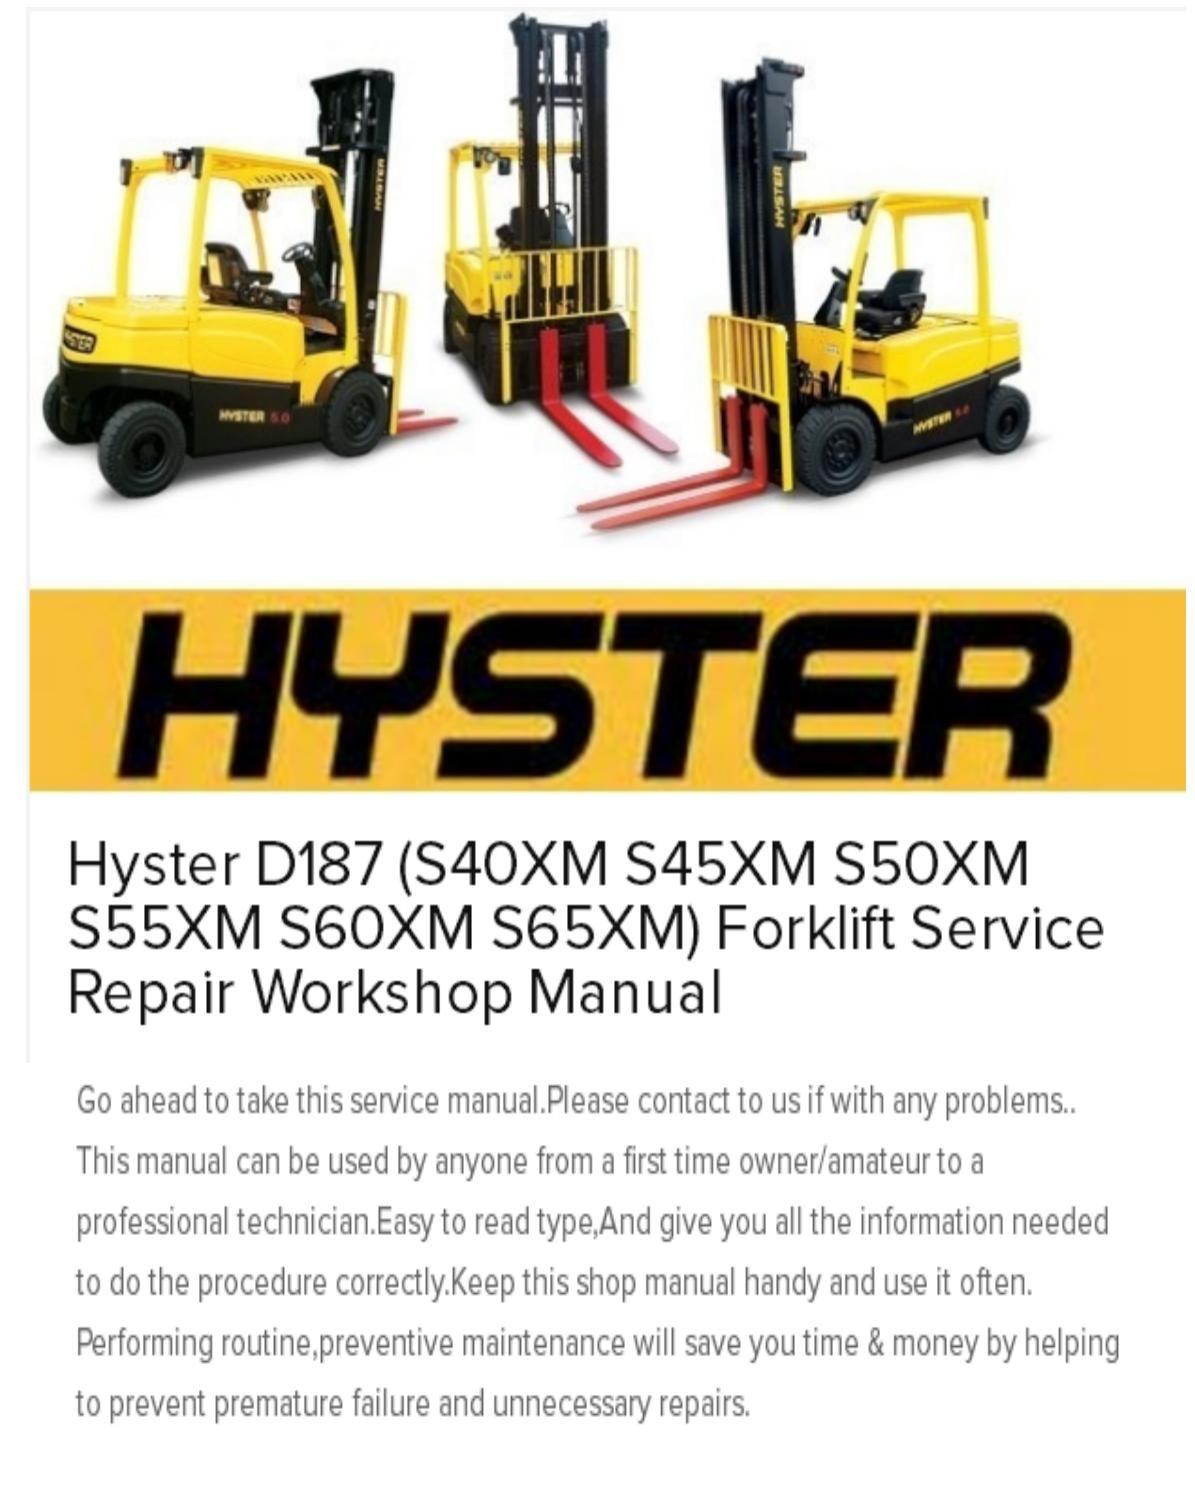 hyster s50xm forklift wiring diagram christianity vs islam venn d187 s40xm s45xm s55xm s60xm s65xm service repair workshop manual